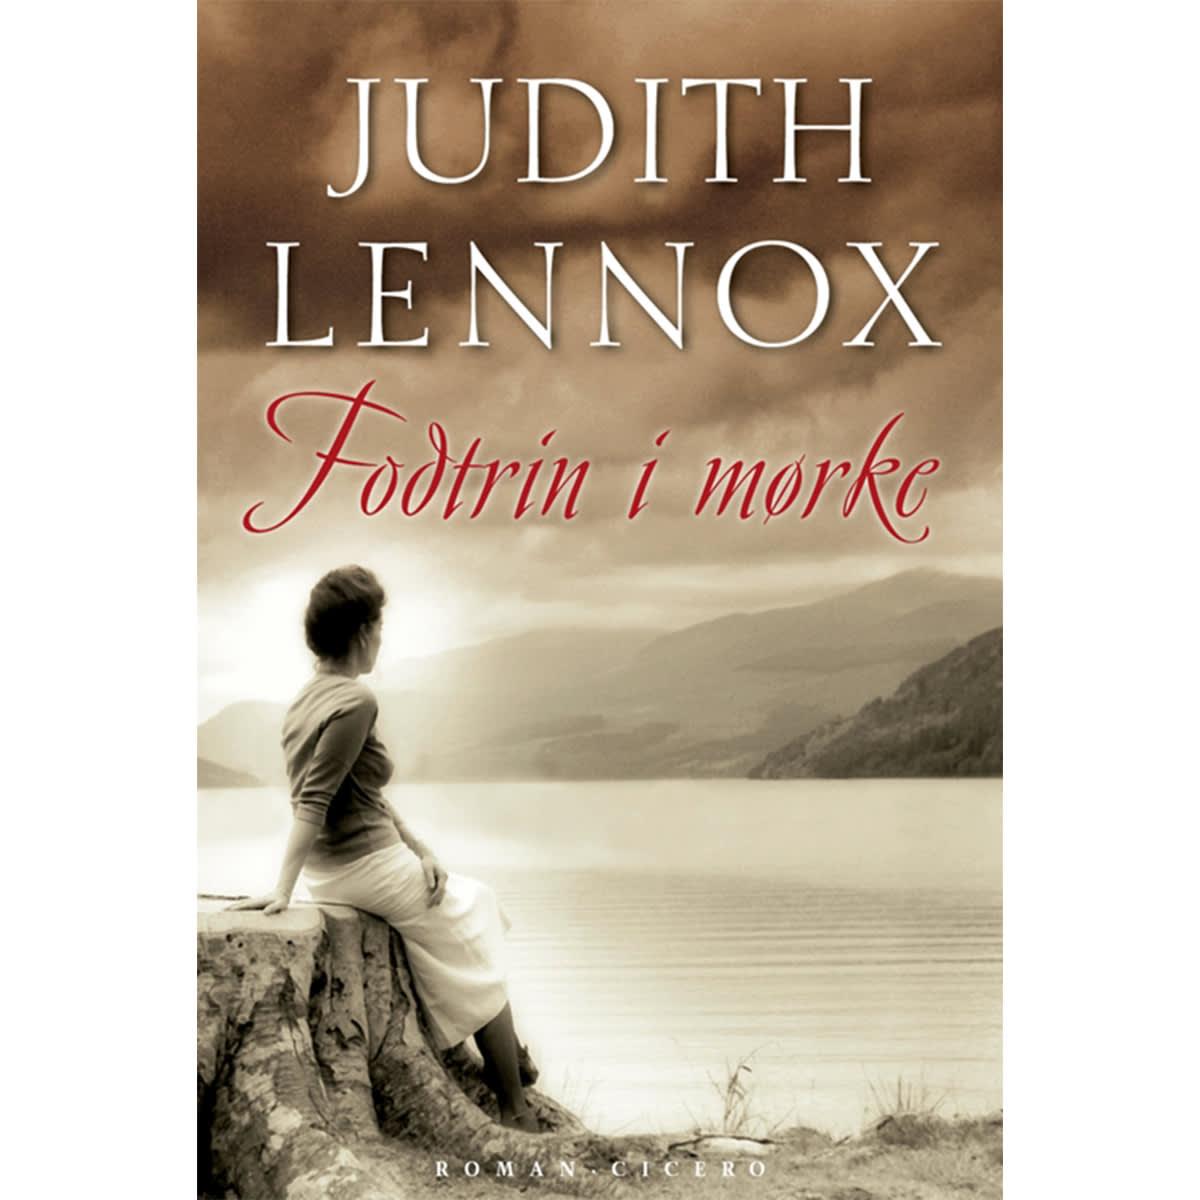 Af Judith Lennox